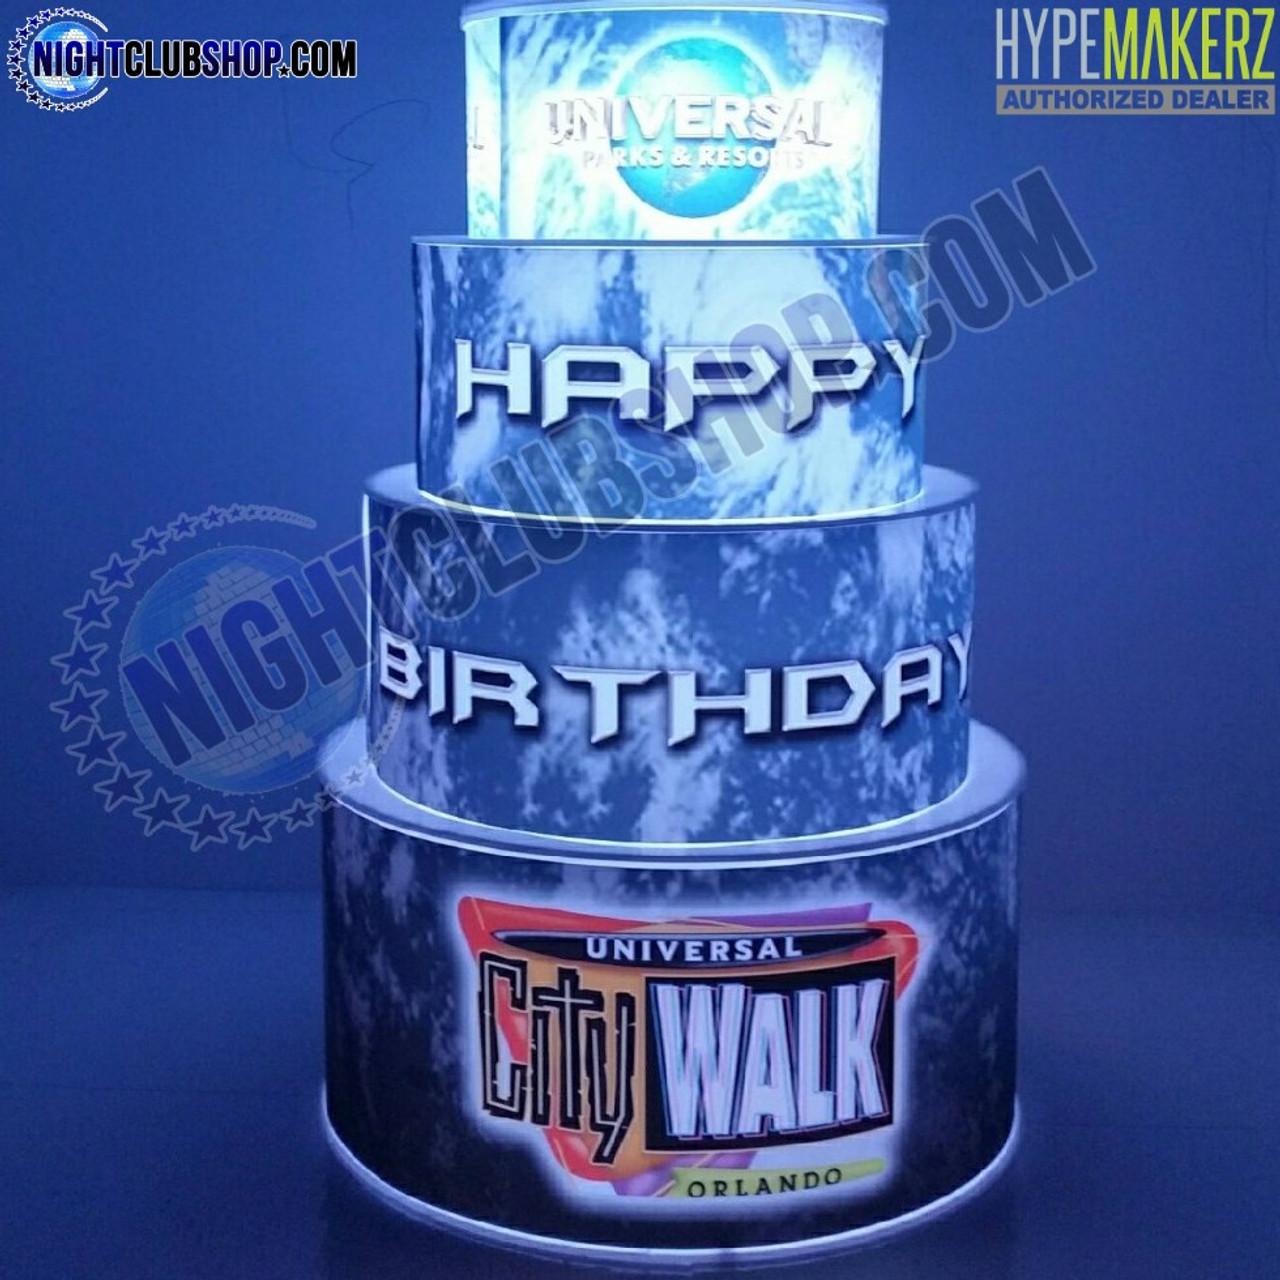 Happy, Birthday, LED, Cake, City, Walk, Universal, Studios, Celebration, RGB, Remote, Controlled, RF, Wireless